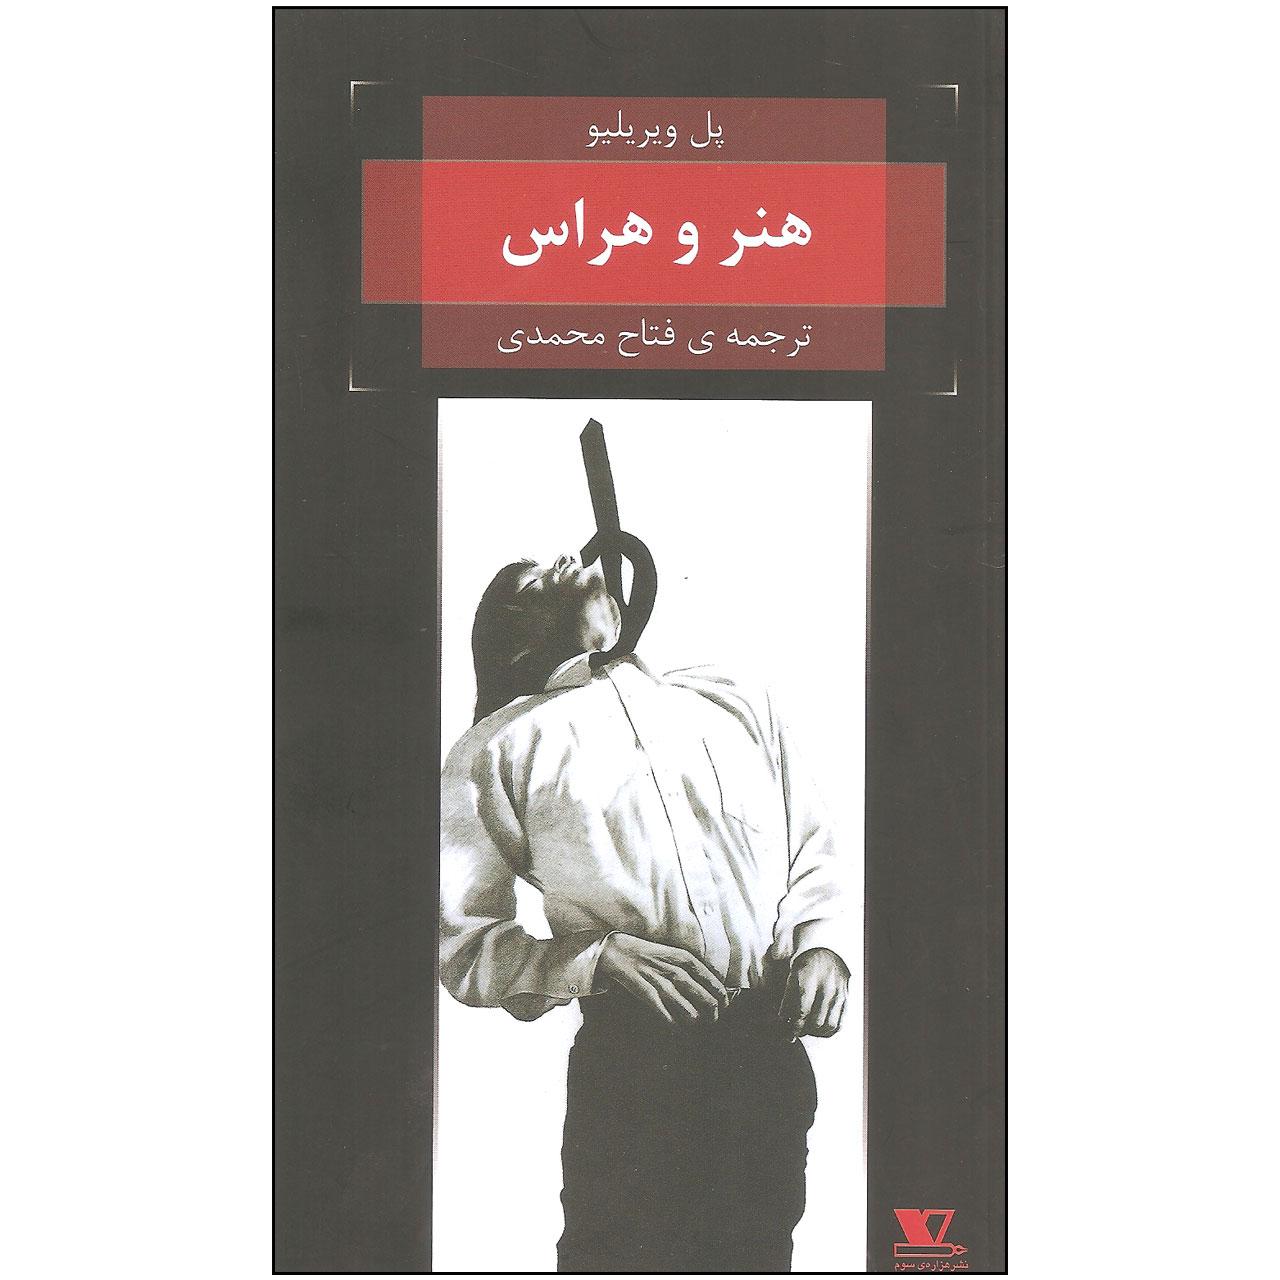 کتاب هنر و هراس اثر پل ویریلیو نشر هزاره سوم